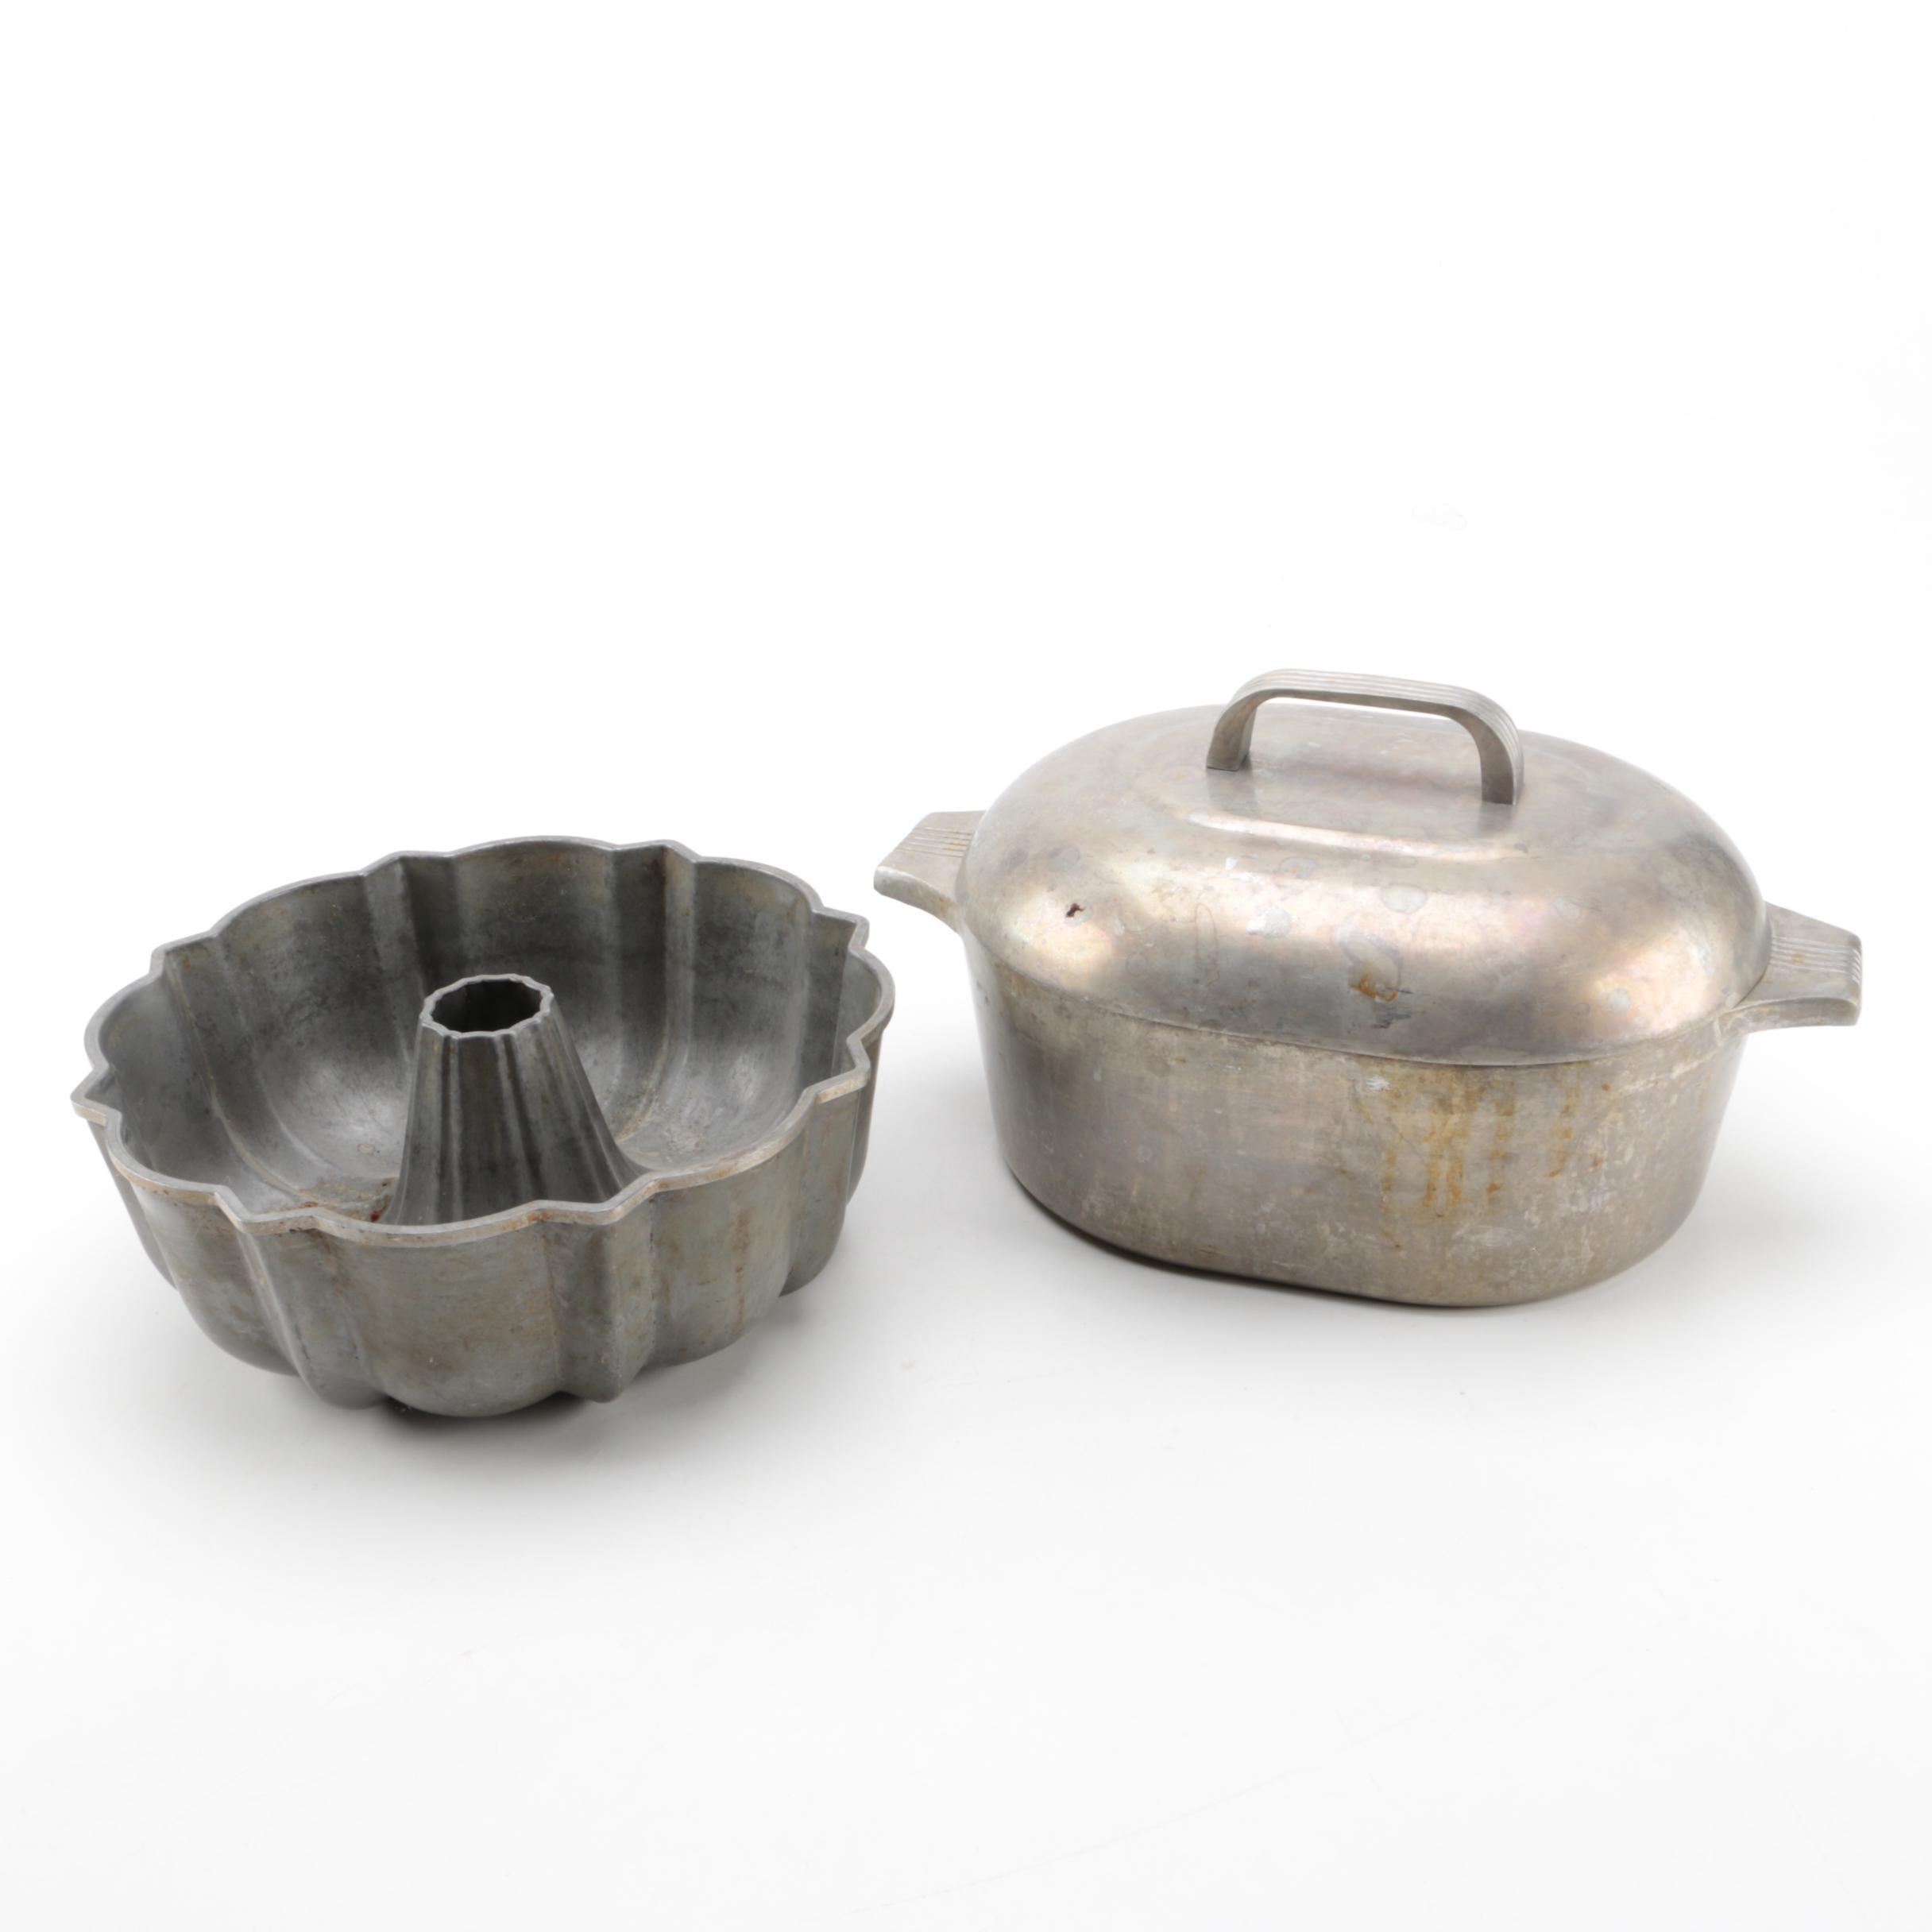 Wagner Ware Magnalite Roasterette and Bundt Pan